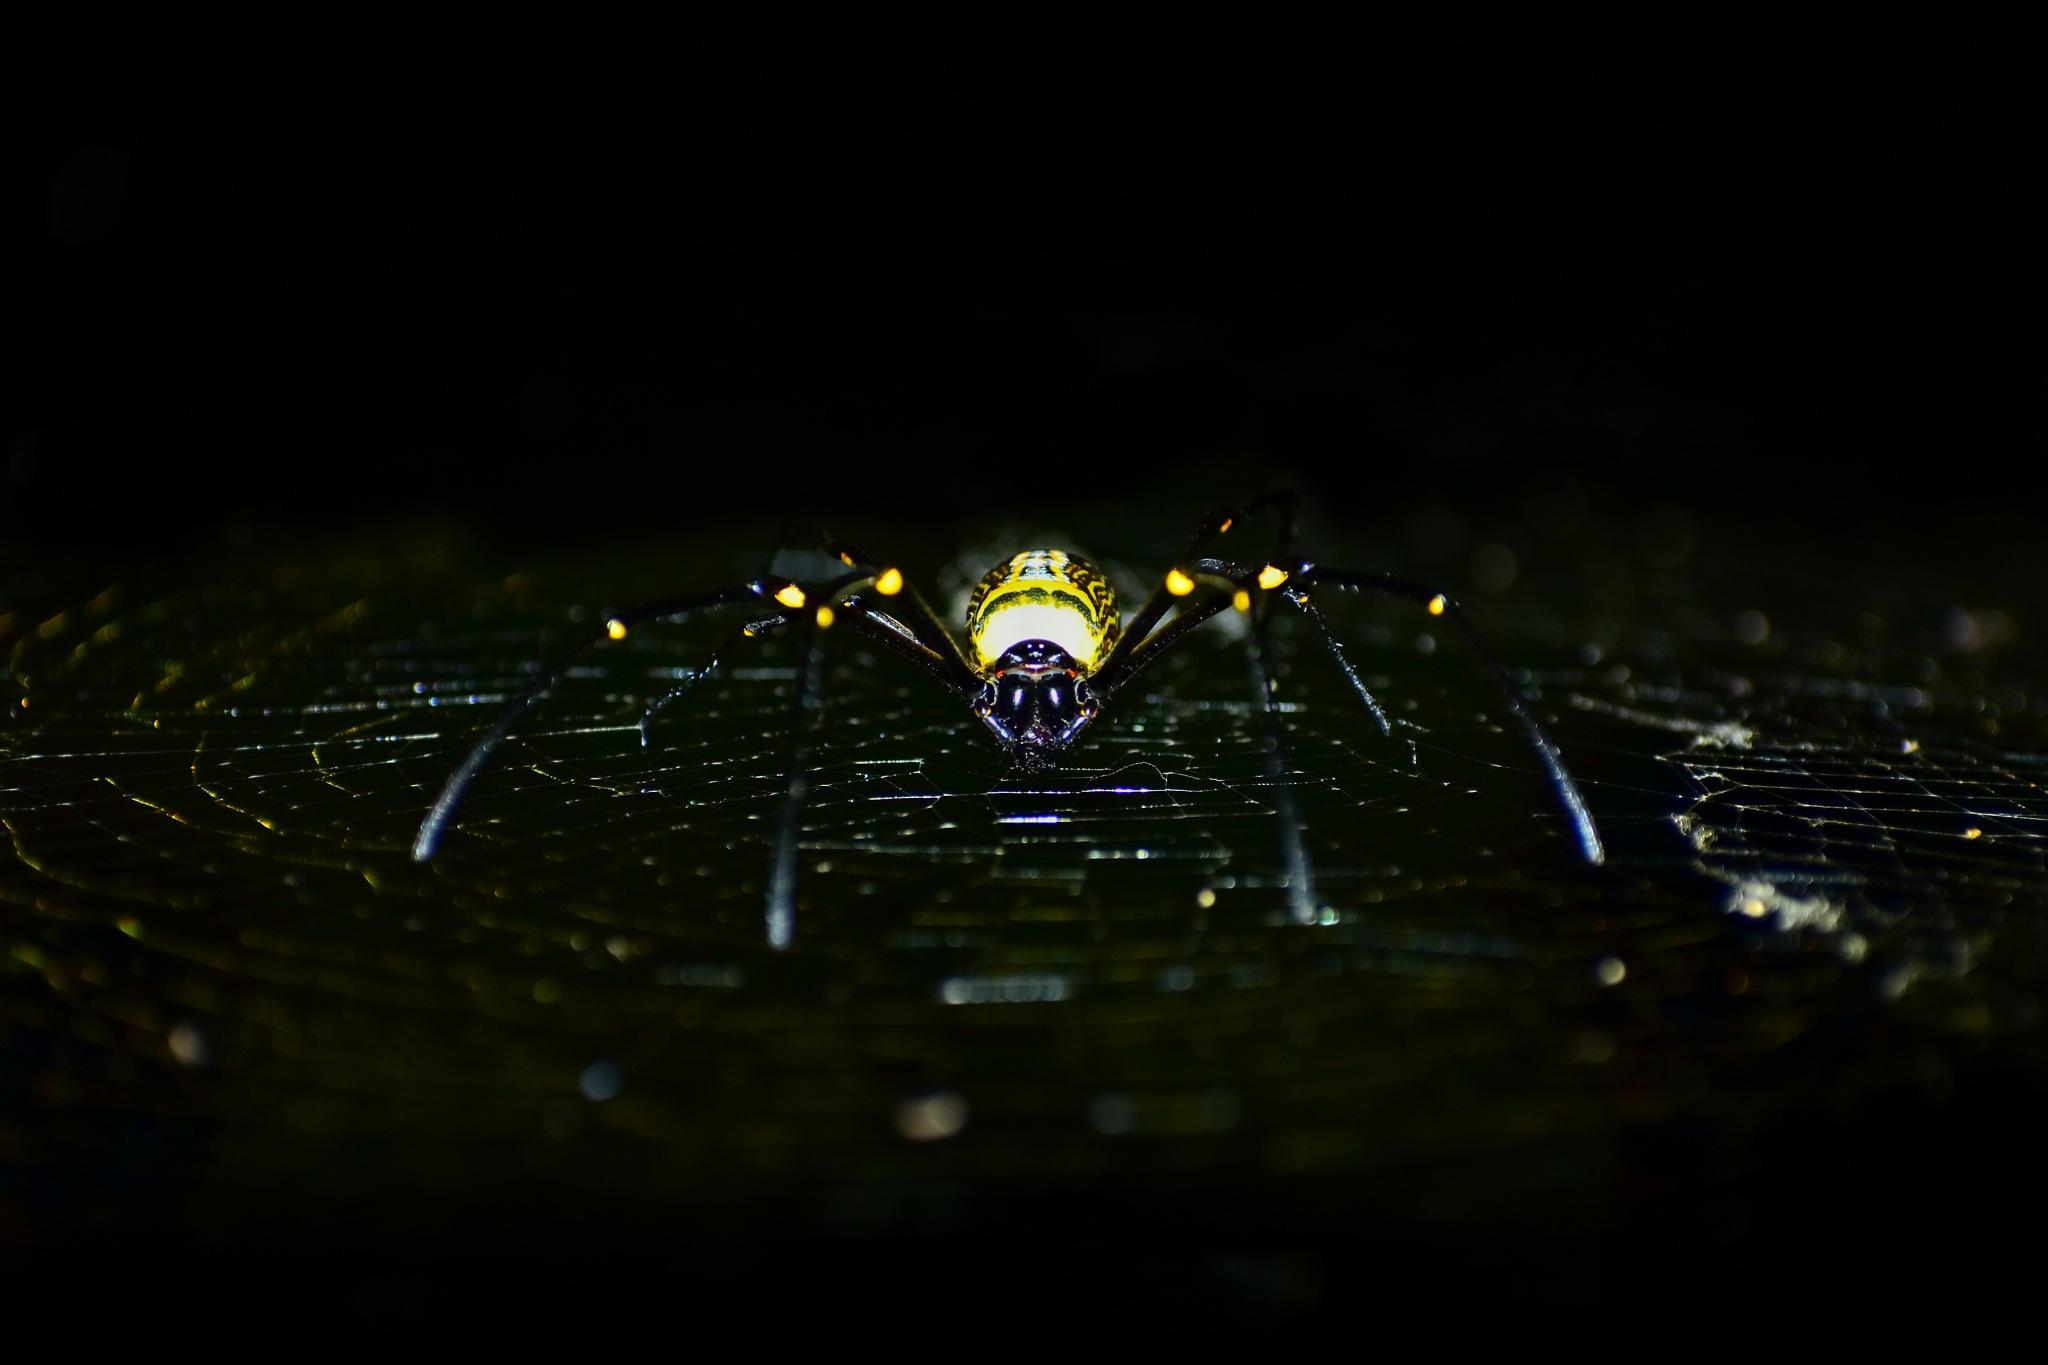 flash spider by Rahul Lohar